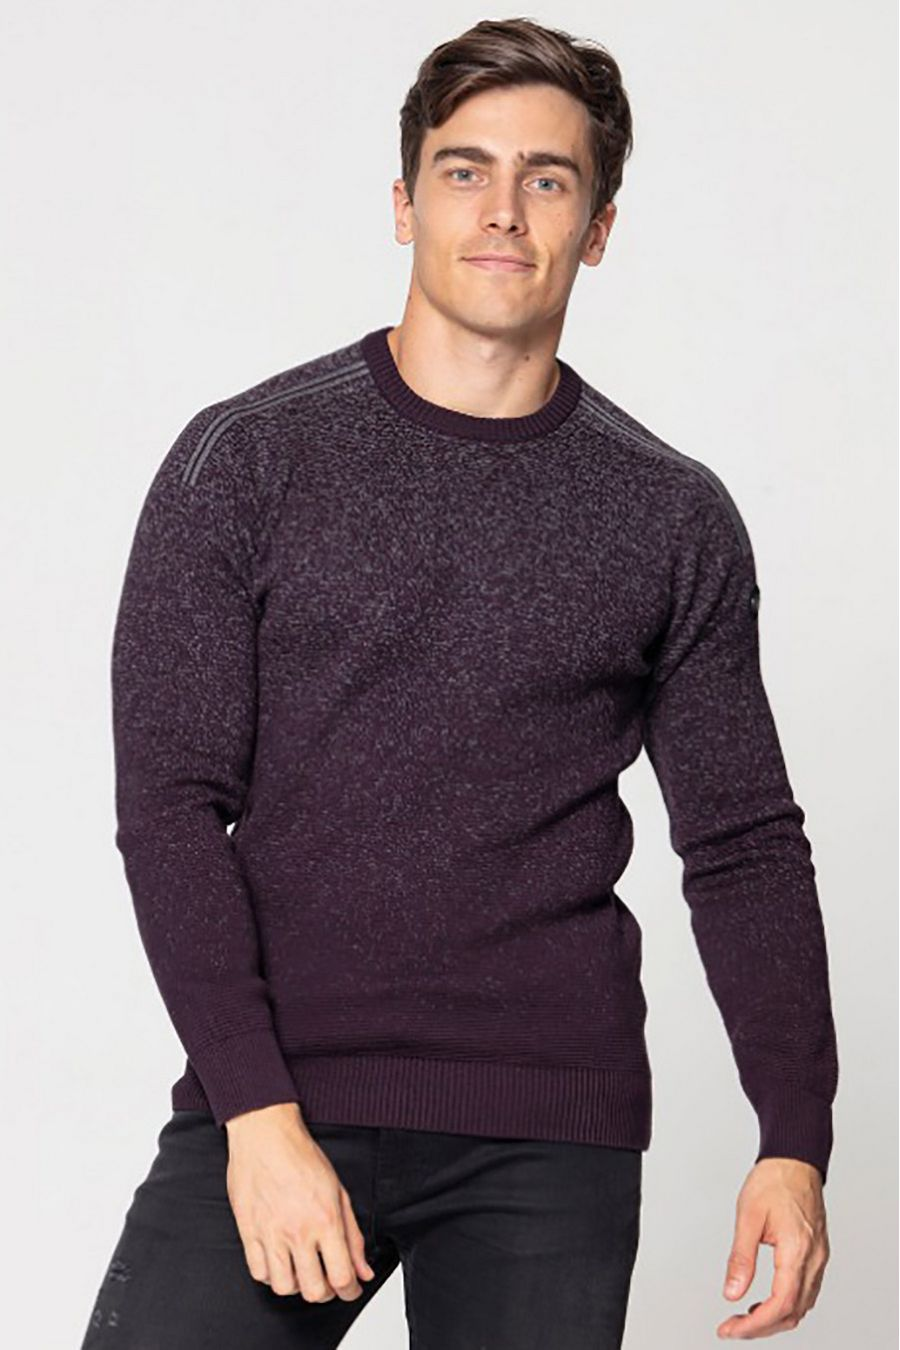 Джемпер (свитер) мужской Pooll Park 201415 Purple - фото 1